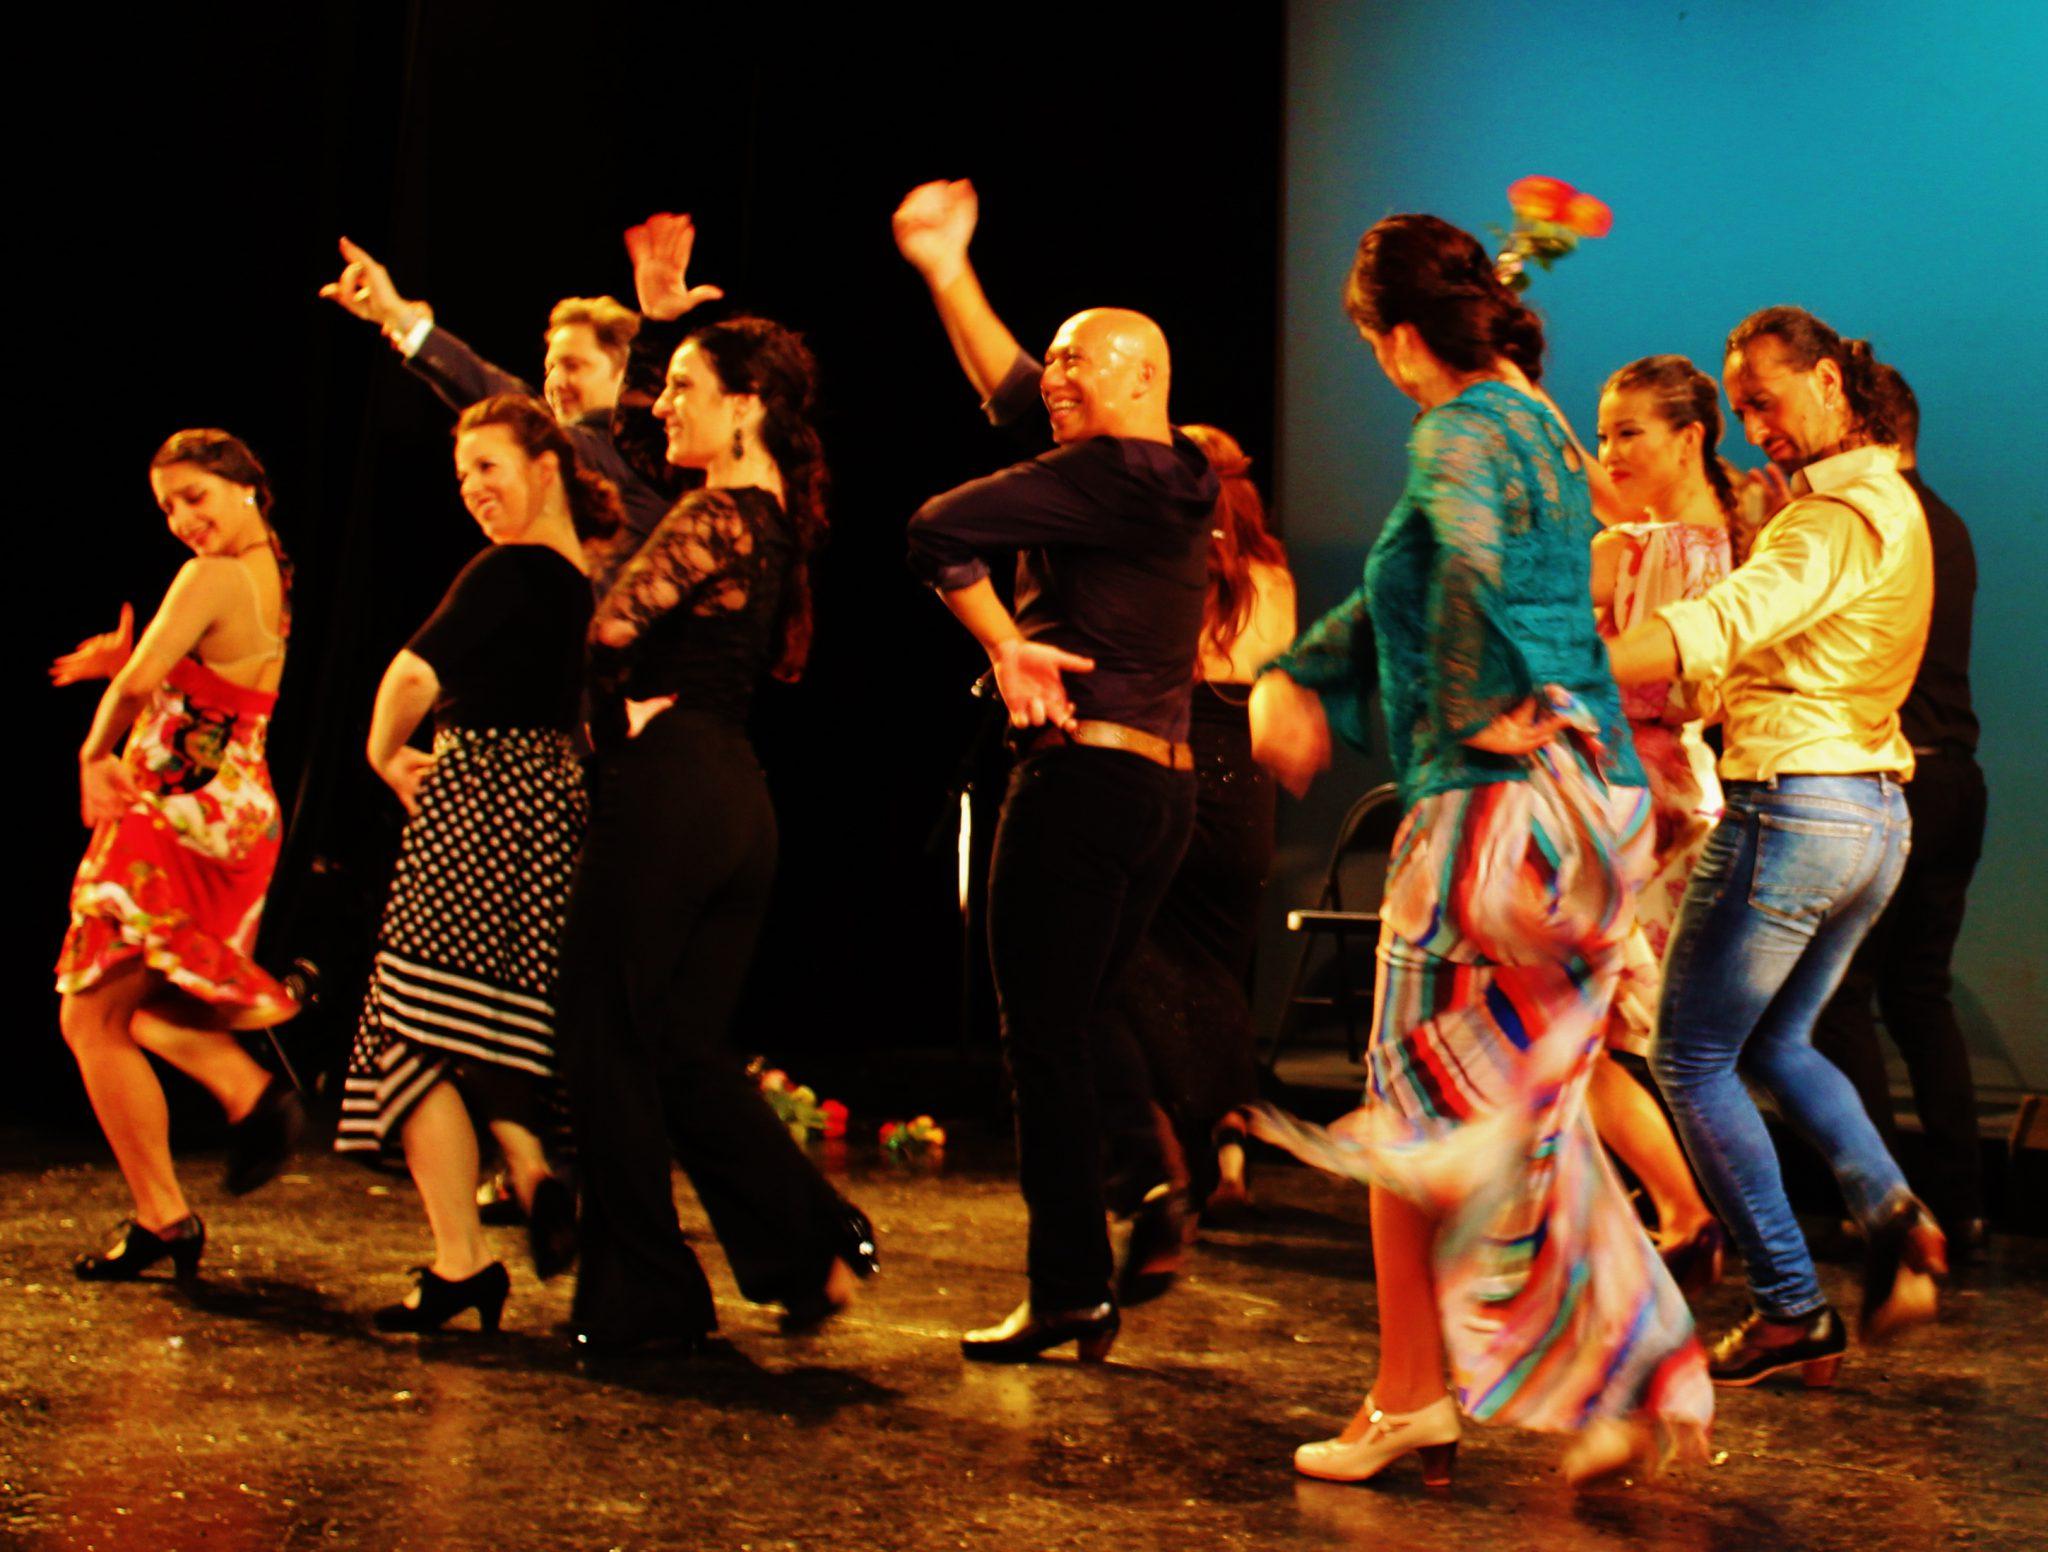 FLAMENCO BAND OF GYPSIES BURNS GALA DANCE STAGE